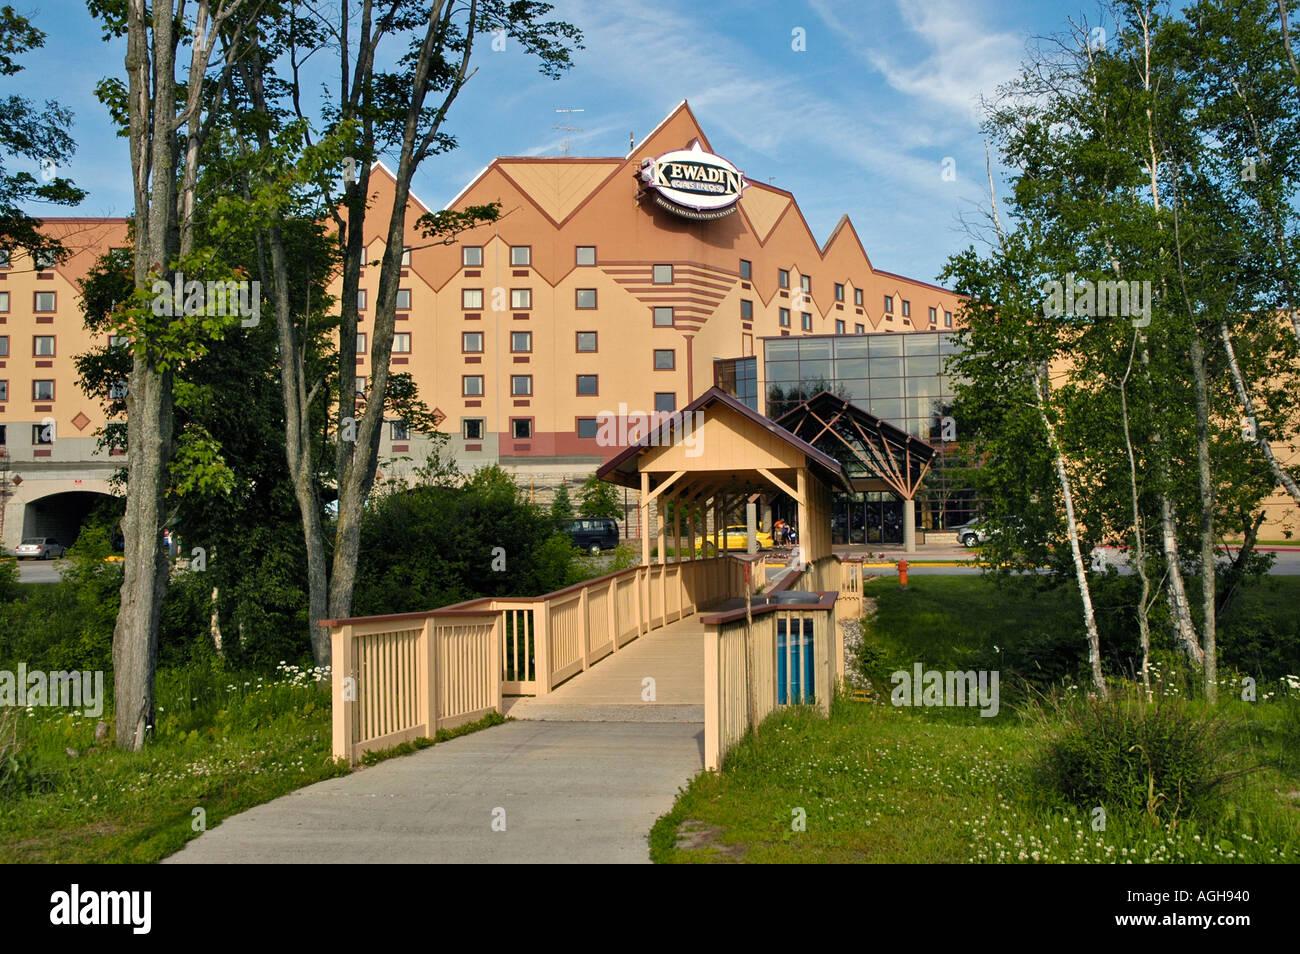 Kewadin Indian Casino at Sault Ste Marie Michigan - Stock Image